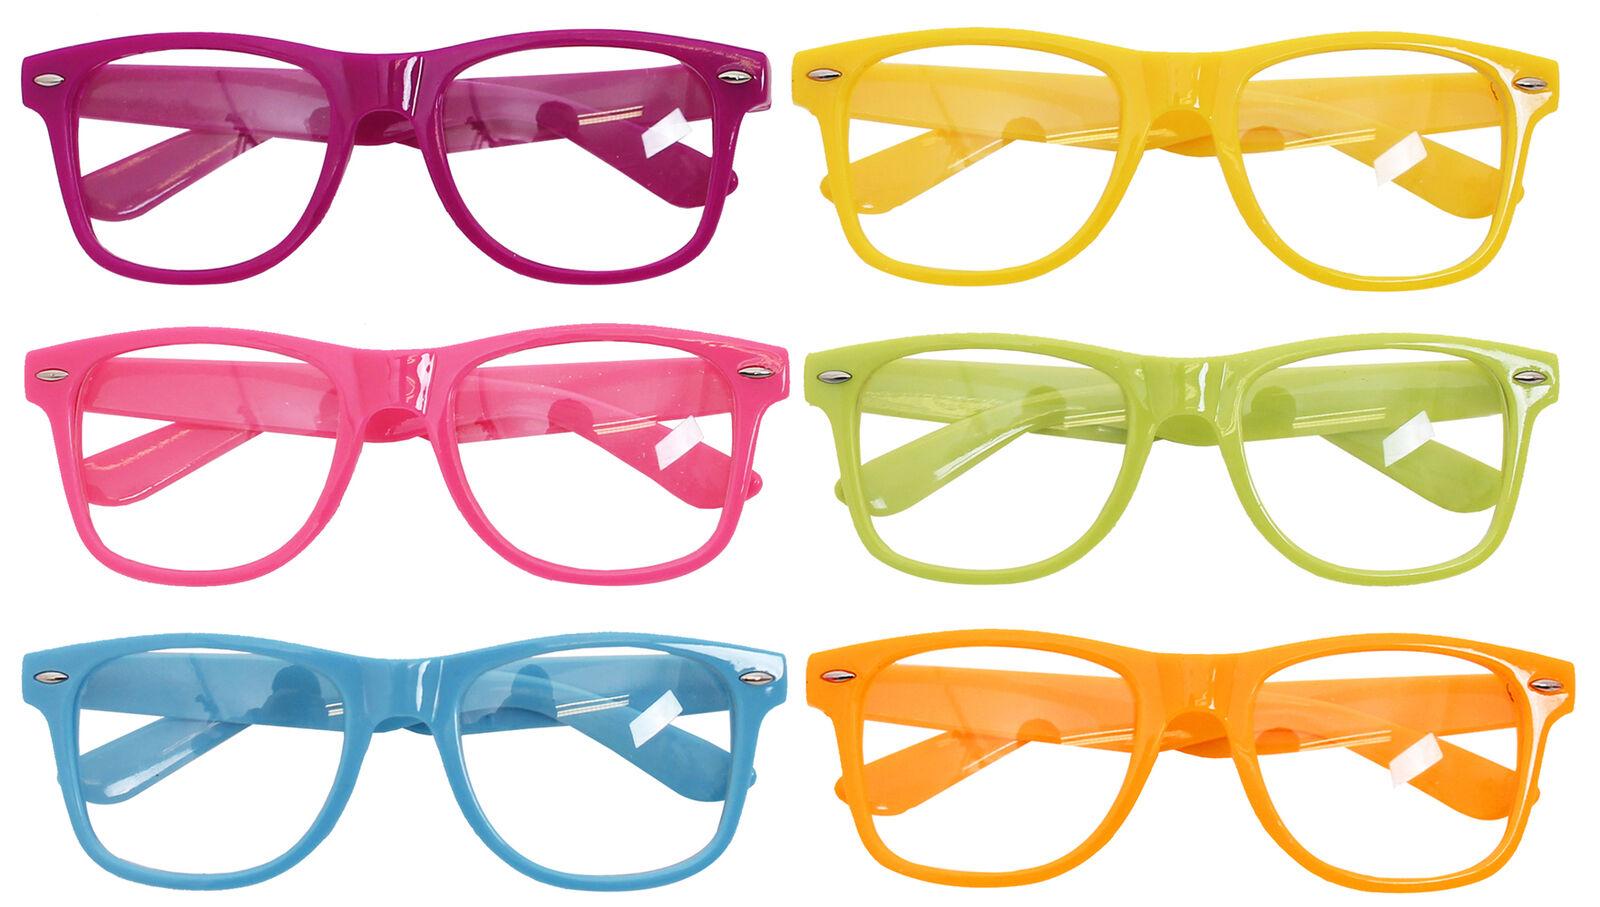 Unisex Nerd Joke Glasses Novelty Jam Jar Specs Fancy Dress Accessory Thick Lens